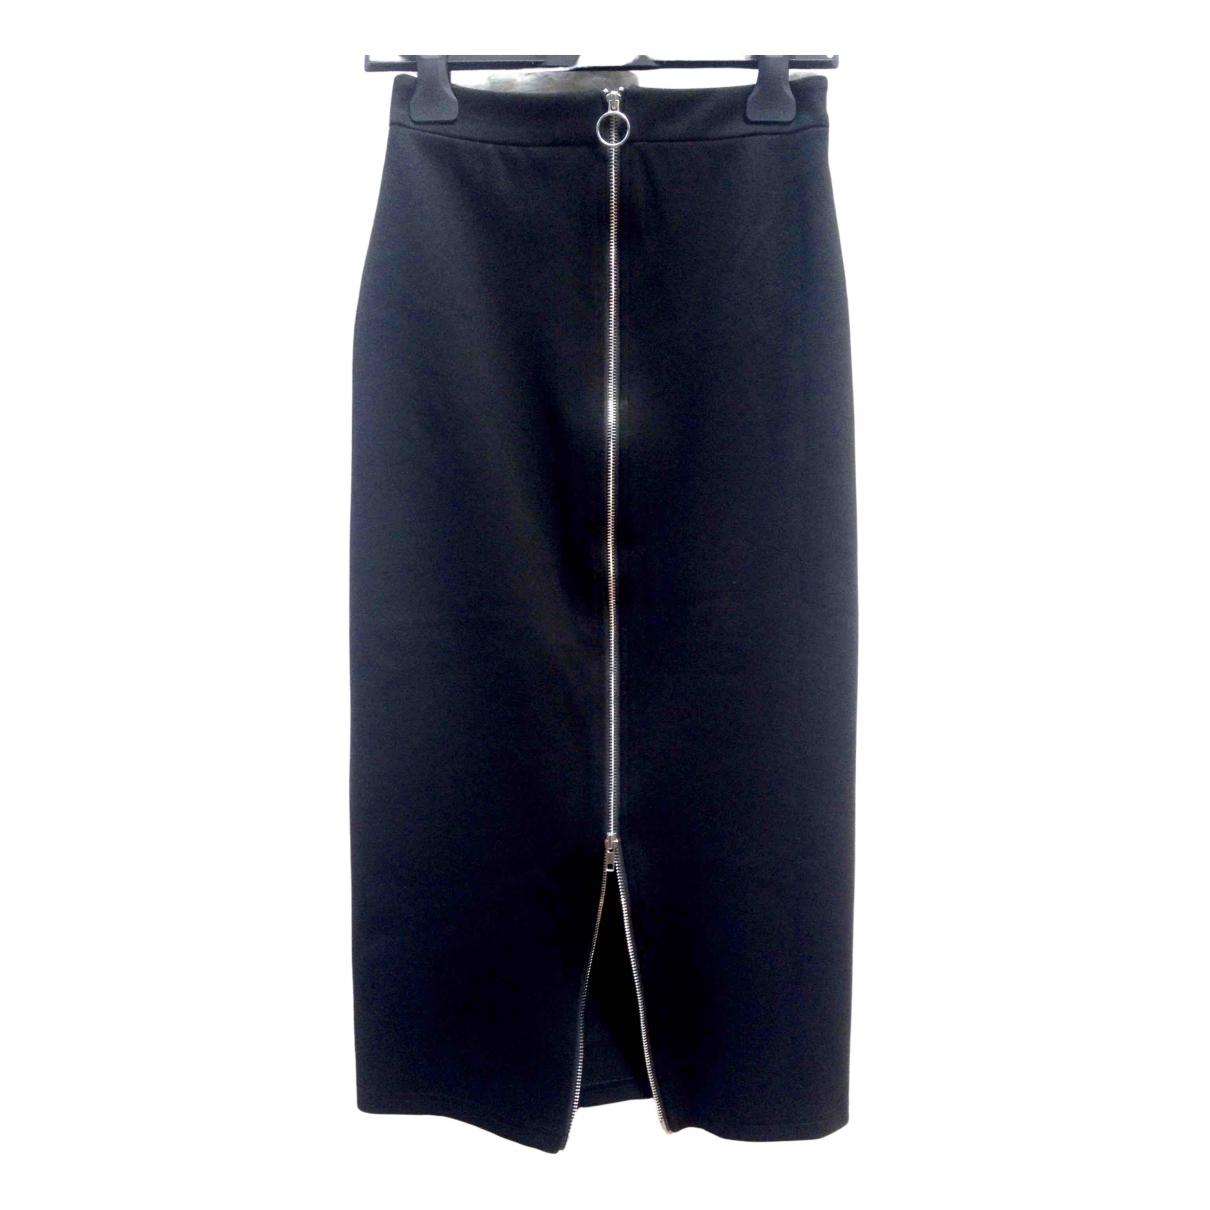 Weili Zheng \N Black Cotton skirt for Women S International